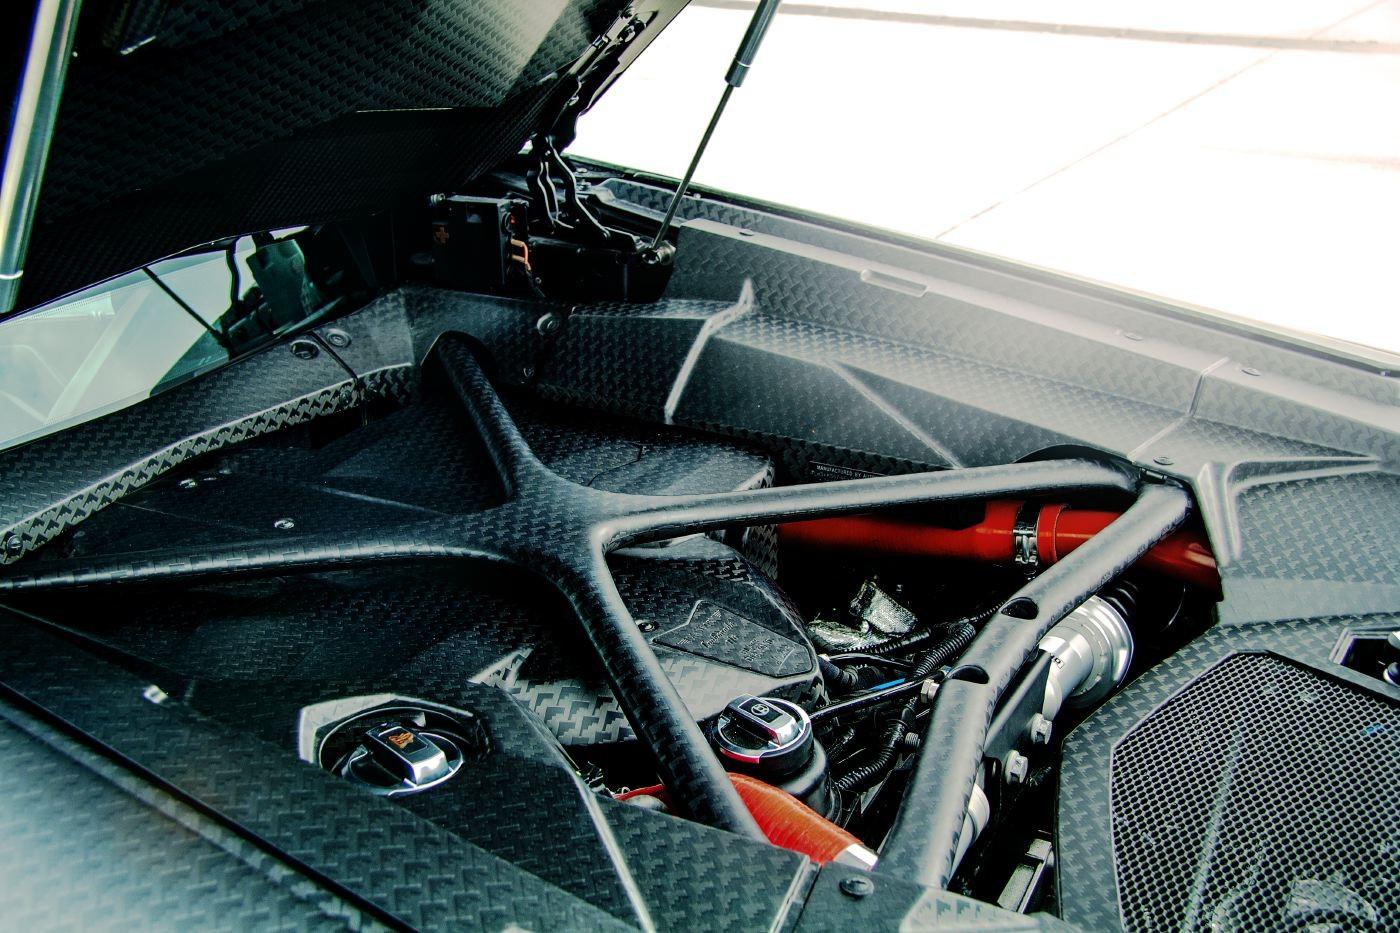 Mansory Carbonado - Lamborghini Aventador LP700-4 - Black Diamond